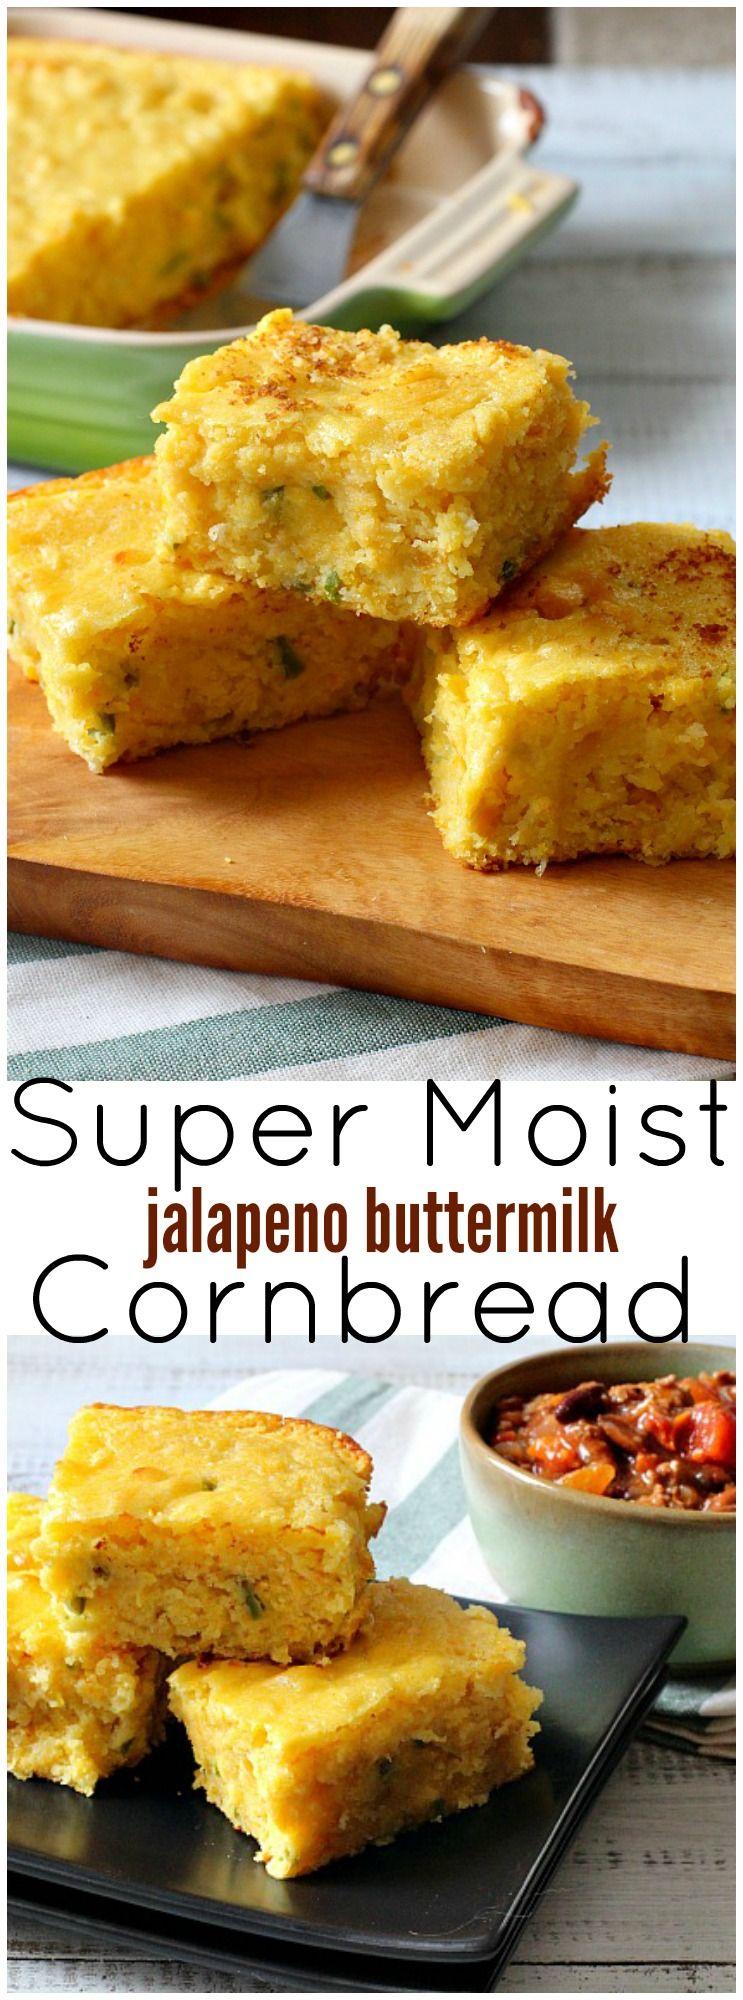 Super Moist Jalapeno Buttermilk Cornbread Recipe Recipe Super Moist Cornbread Recipes Corn Bread Recipe